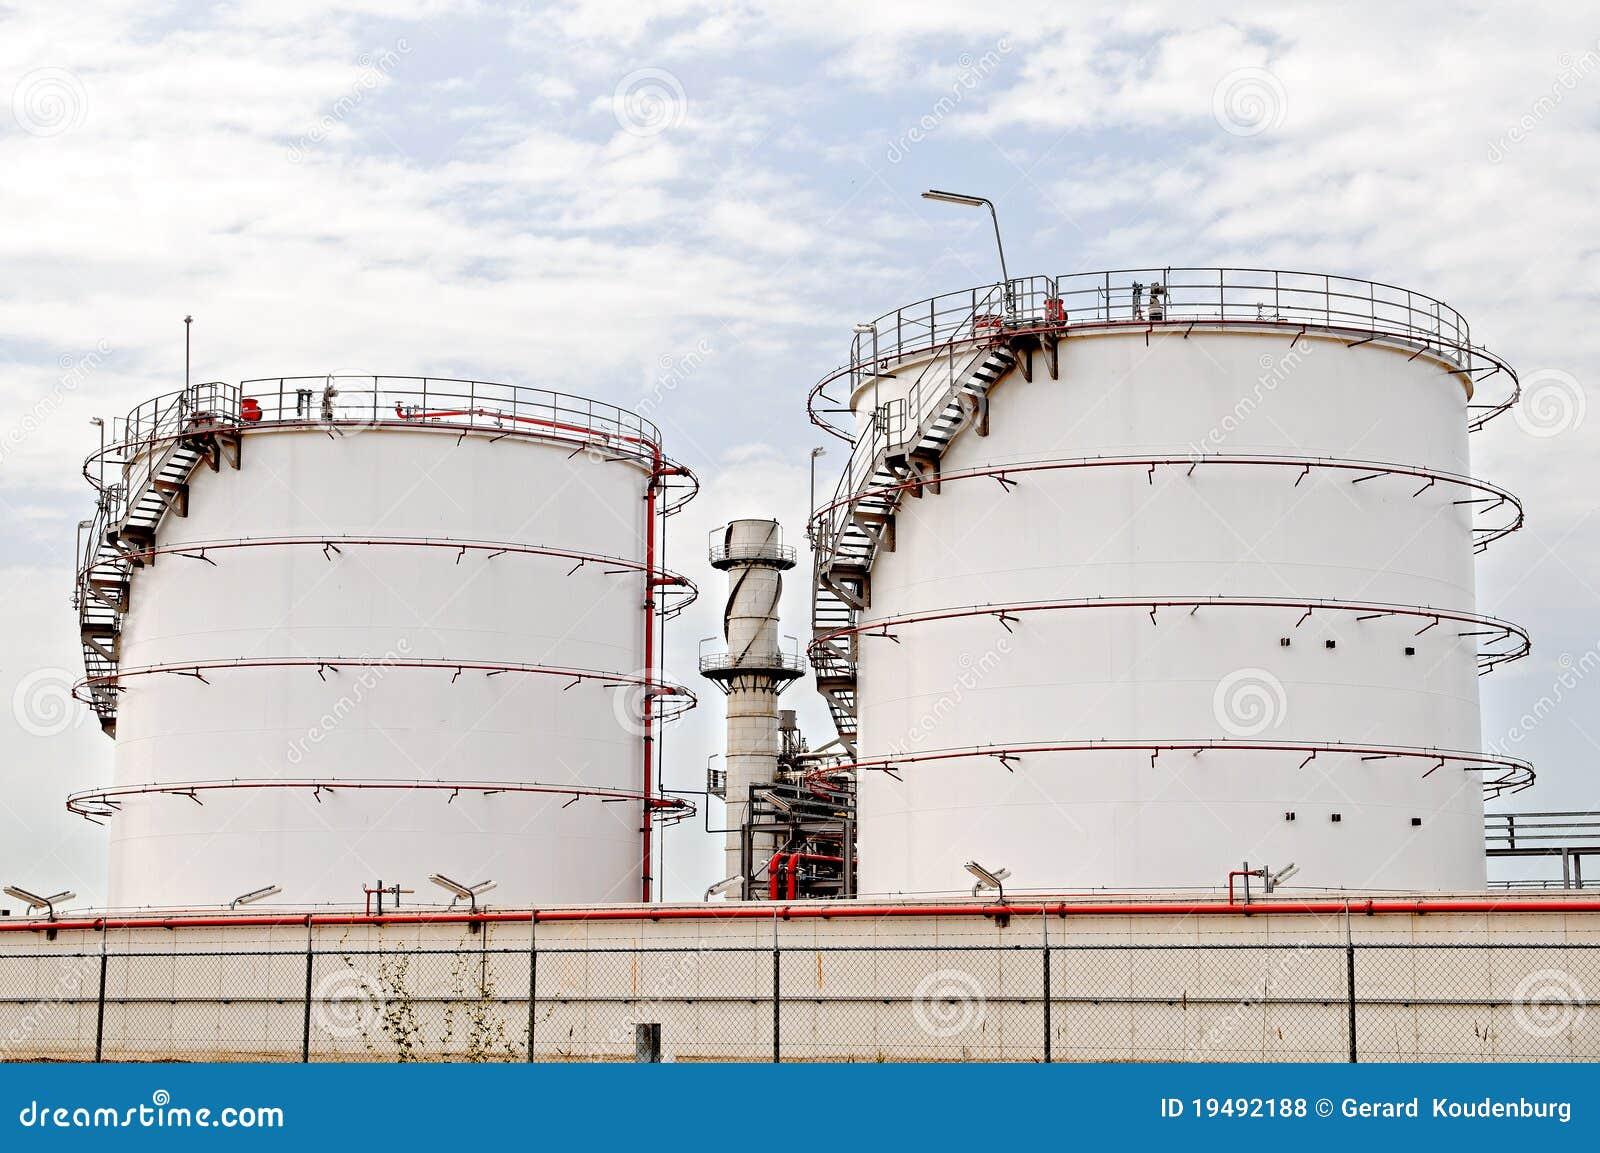 Oil Depot Storage Tanks Royalty Free Stock Photos Image